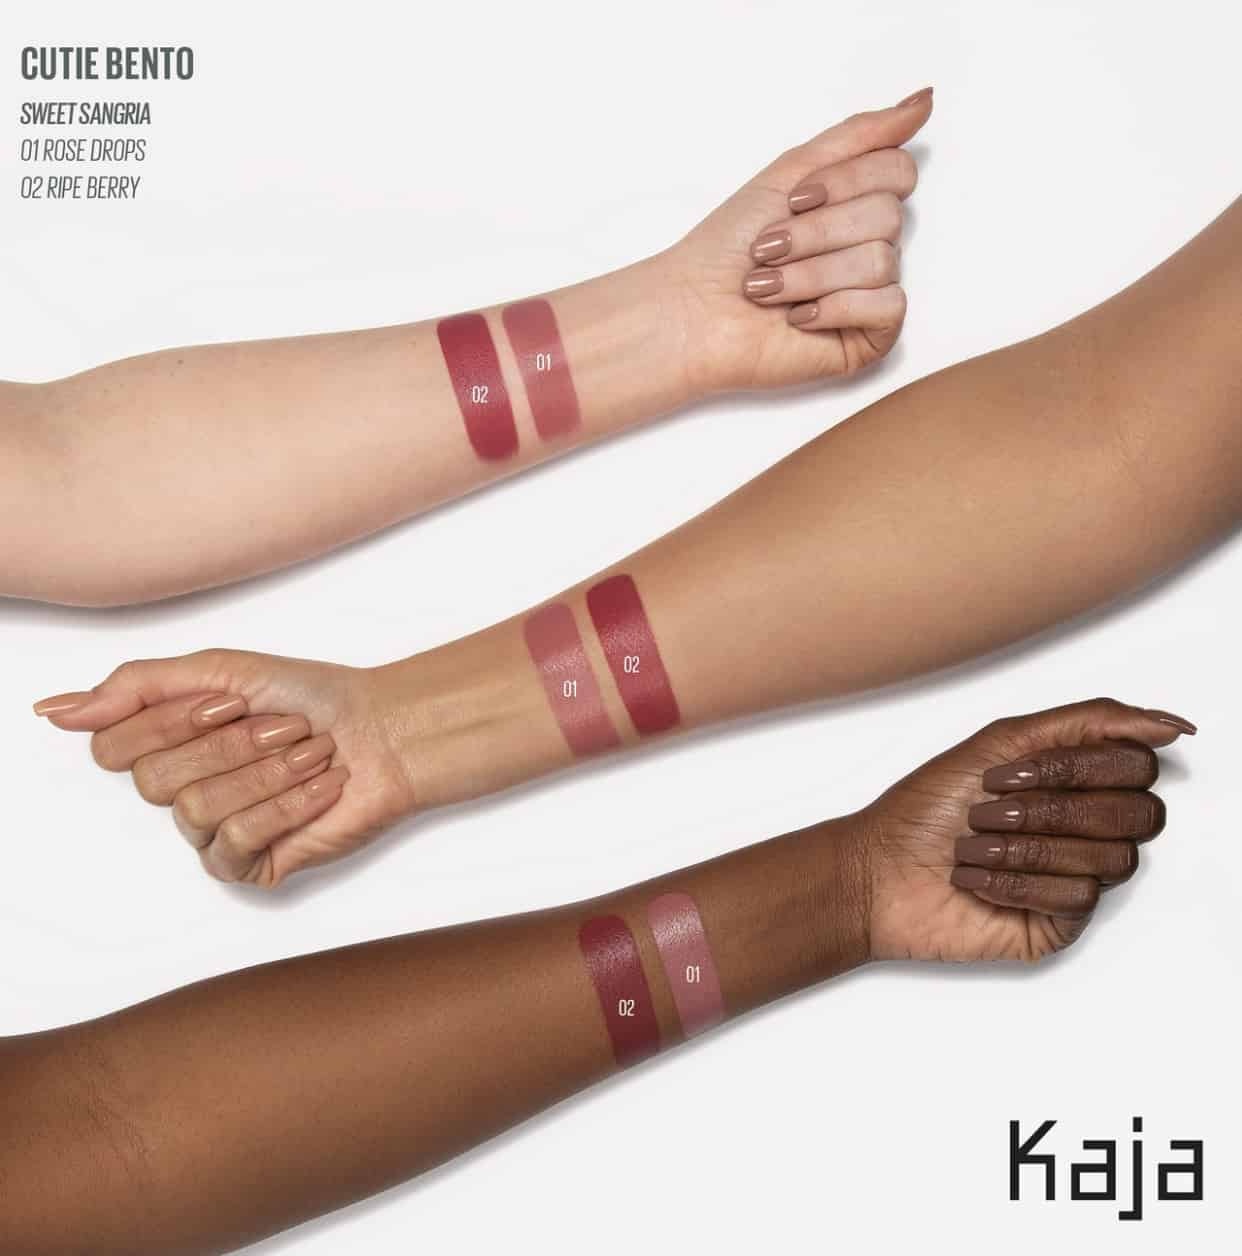 Kaja Cutie Bento Creamy Lip & Cheek Duo